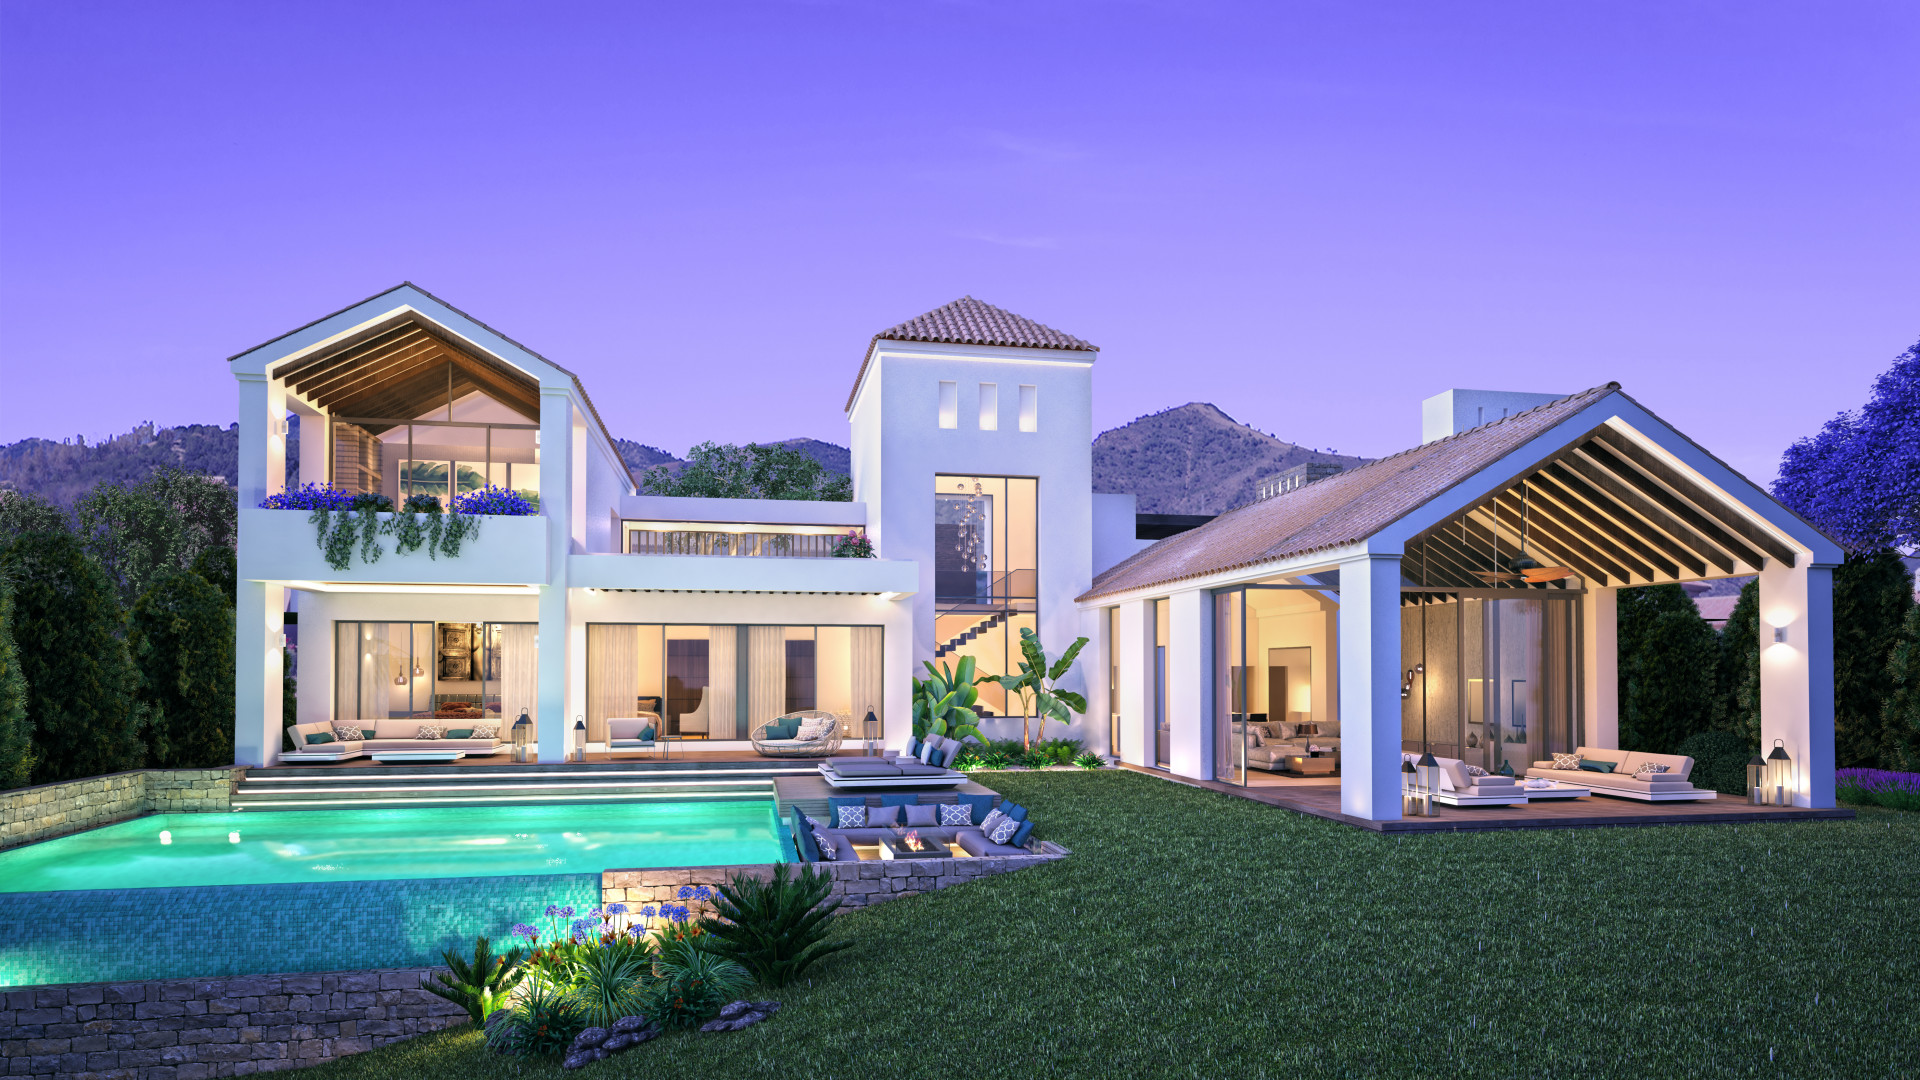 Moderne luxe villa 39 s op golfdomein in estepona spanje for Moderne luxe villa